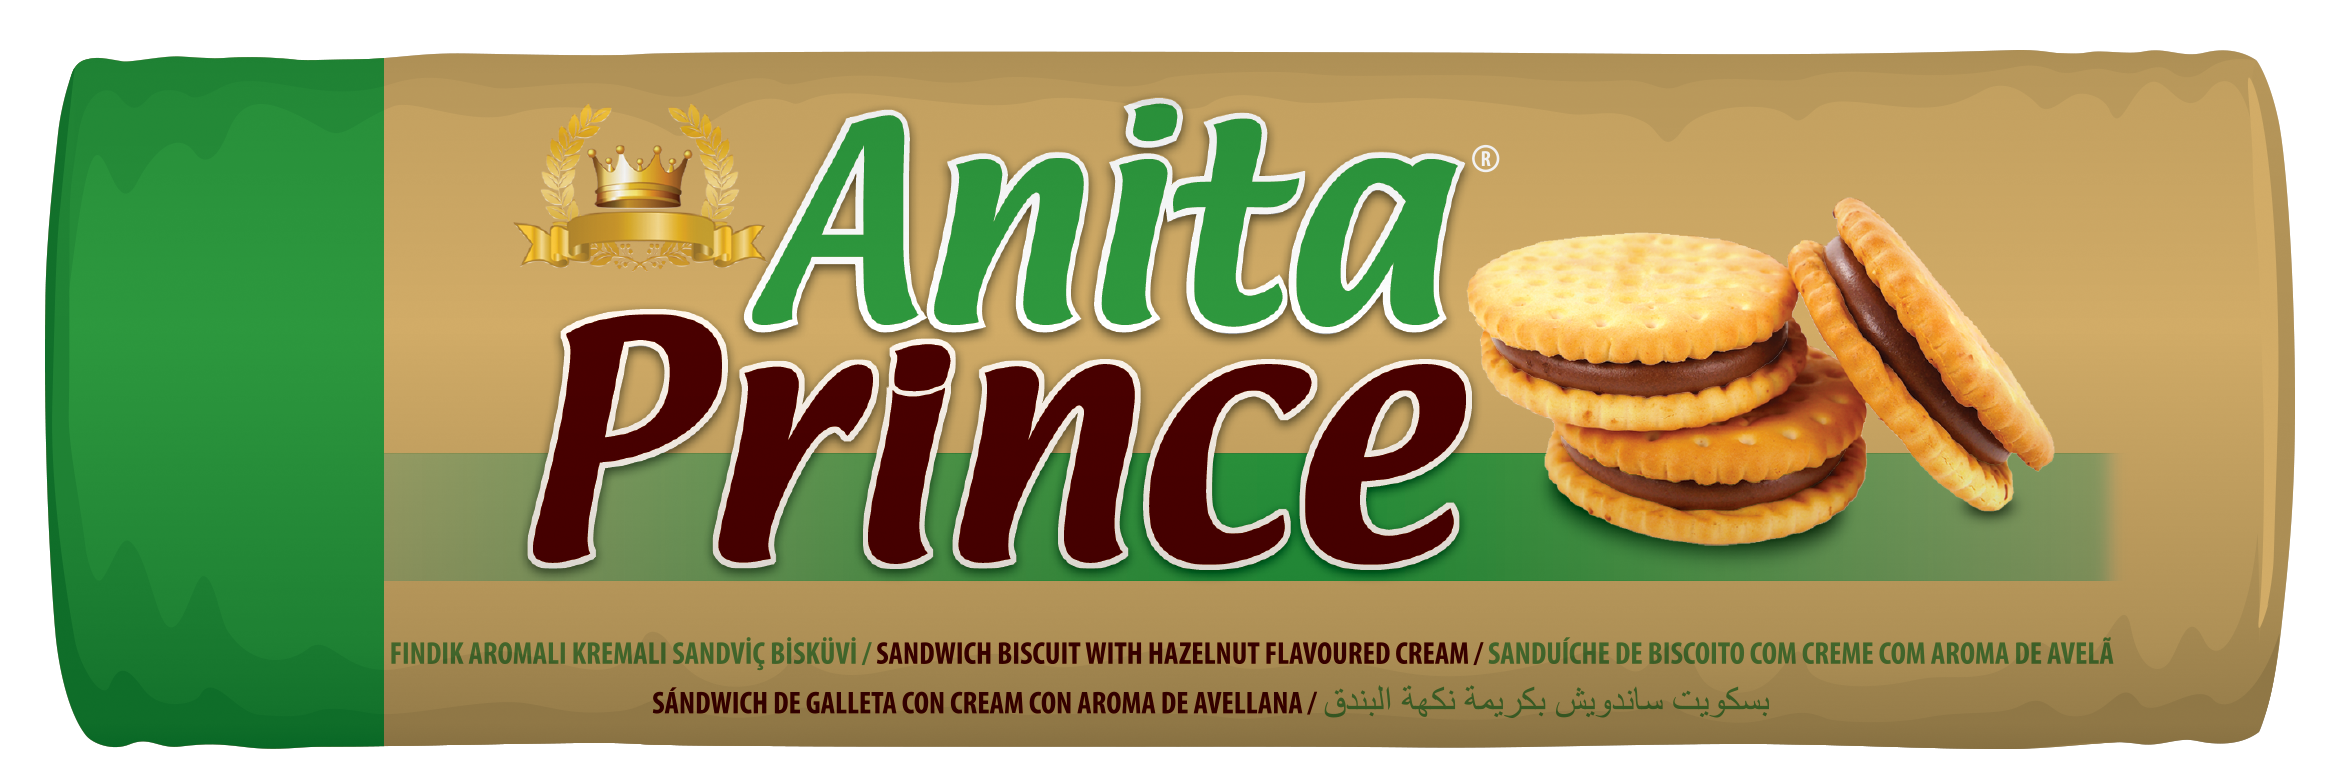 Anita Prince